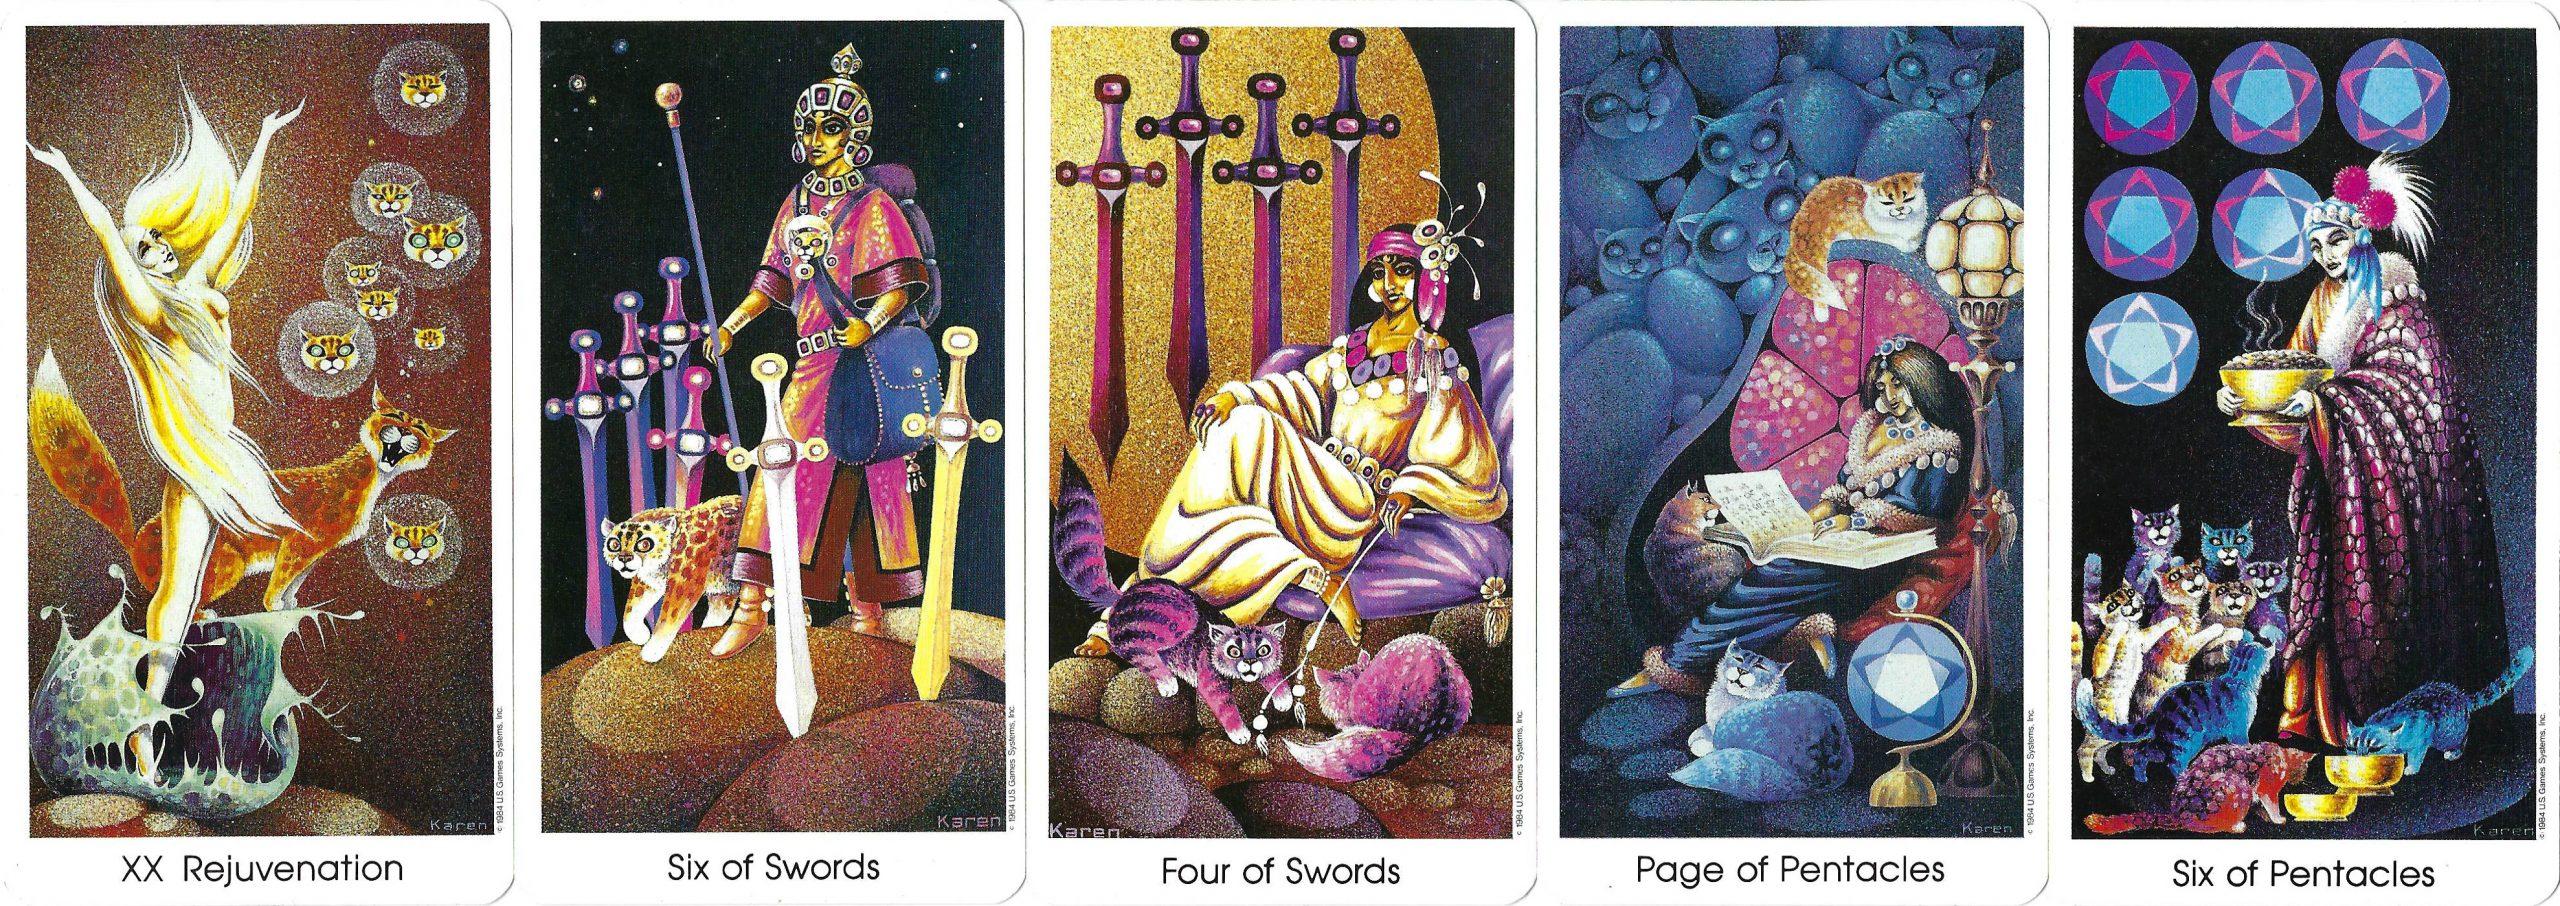 Three Types Of Tarot Cards Joy Vernon Astrology Tarot Reiki Five of swords next card: three types of tarot cards joy vernon